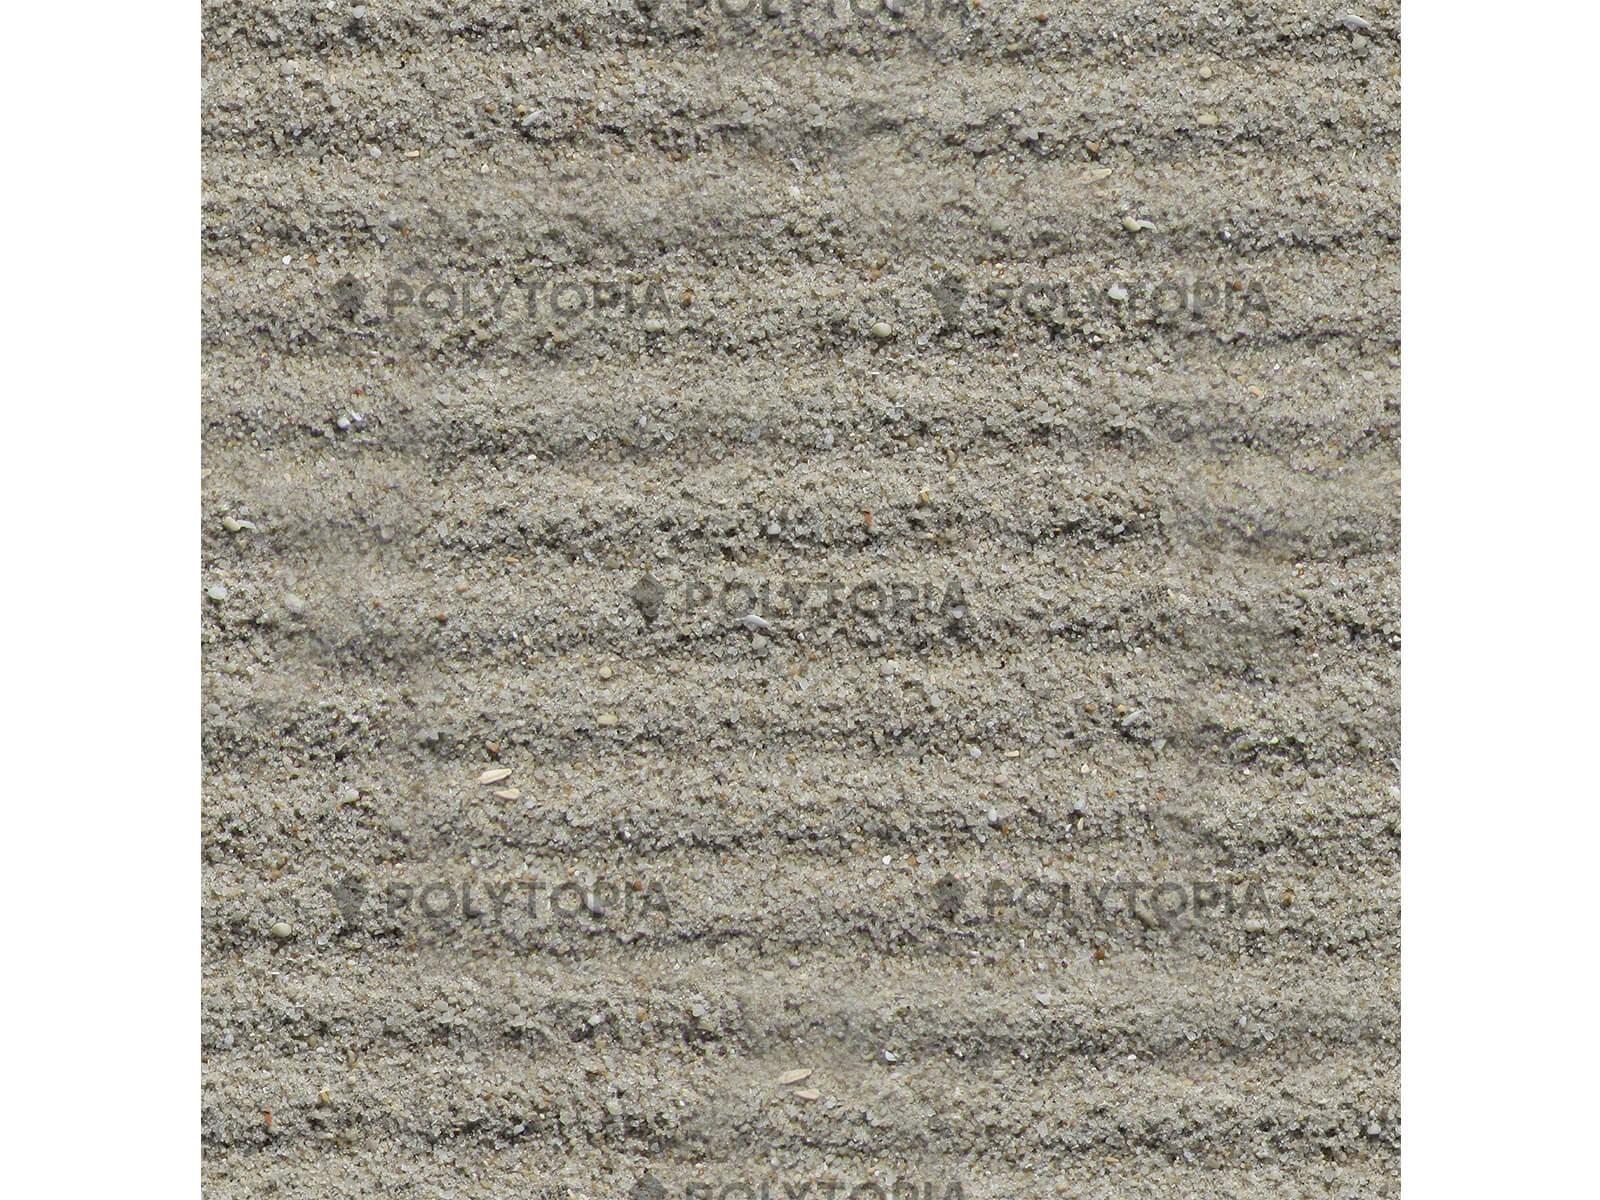 Texture sol sable